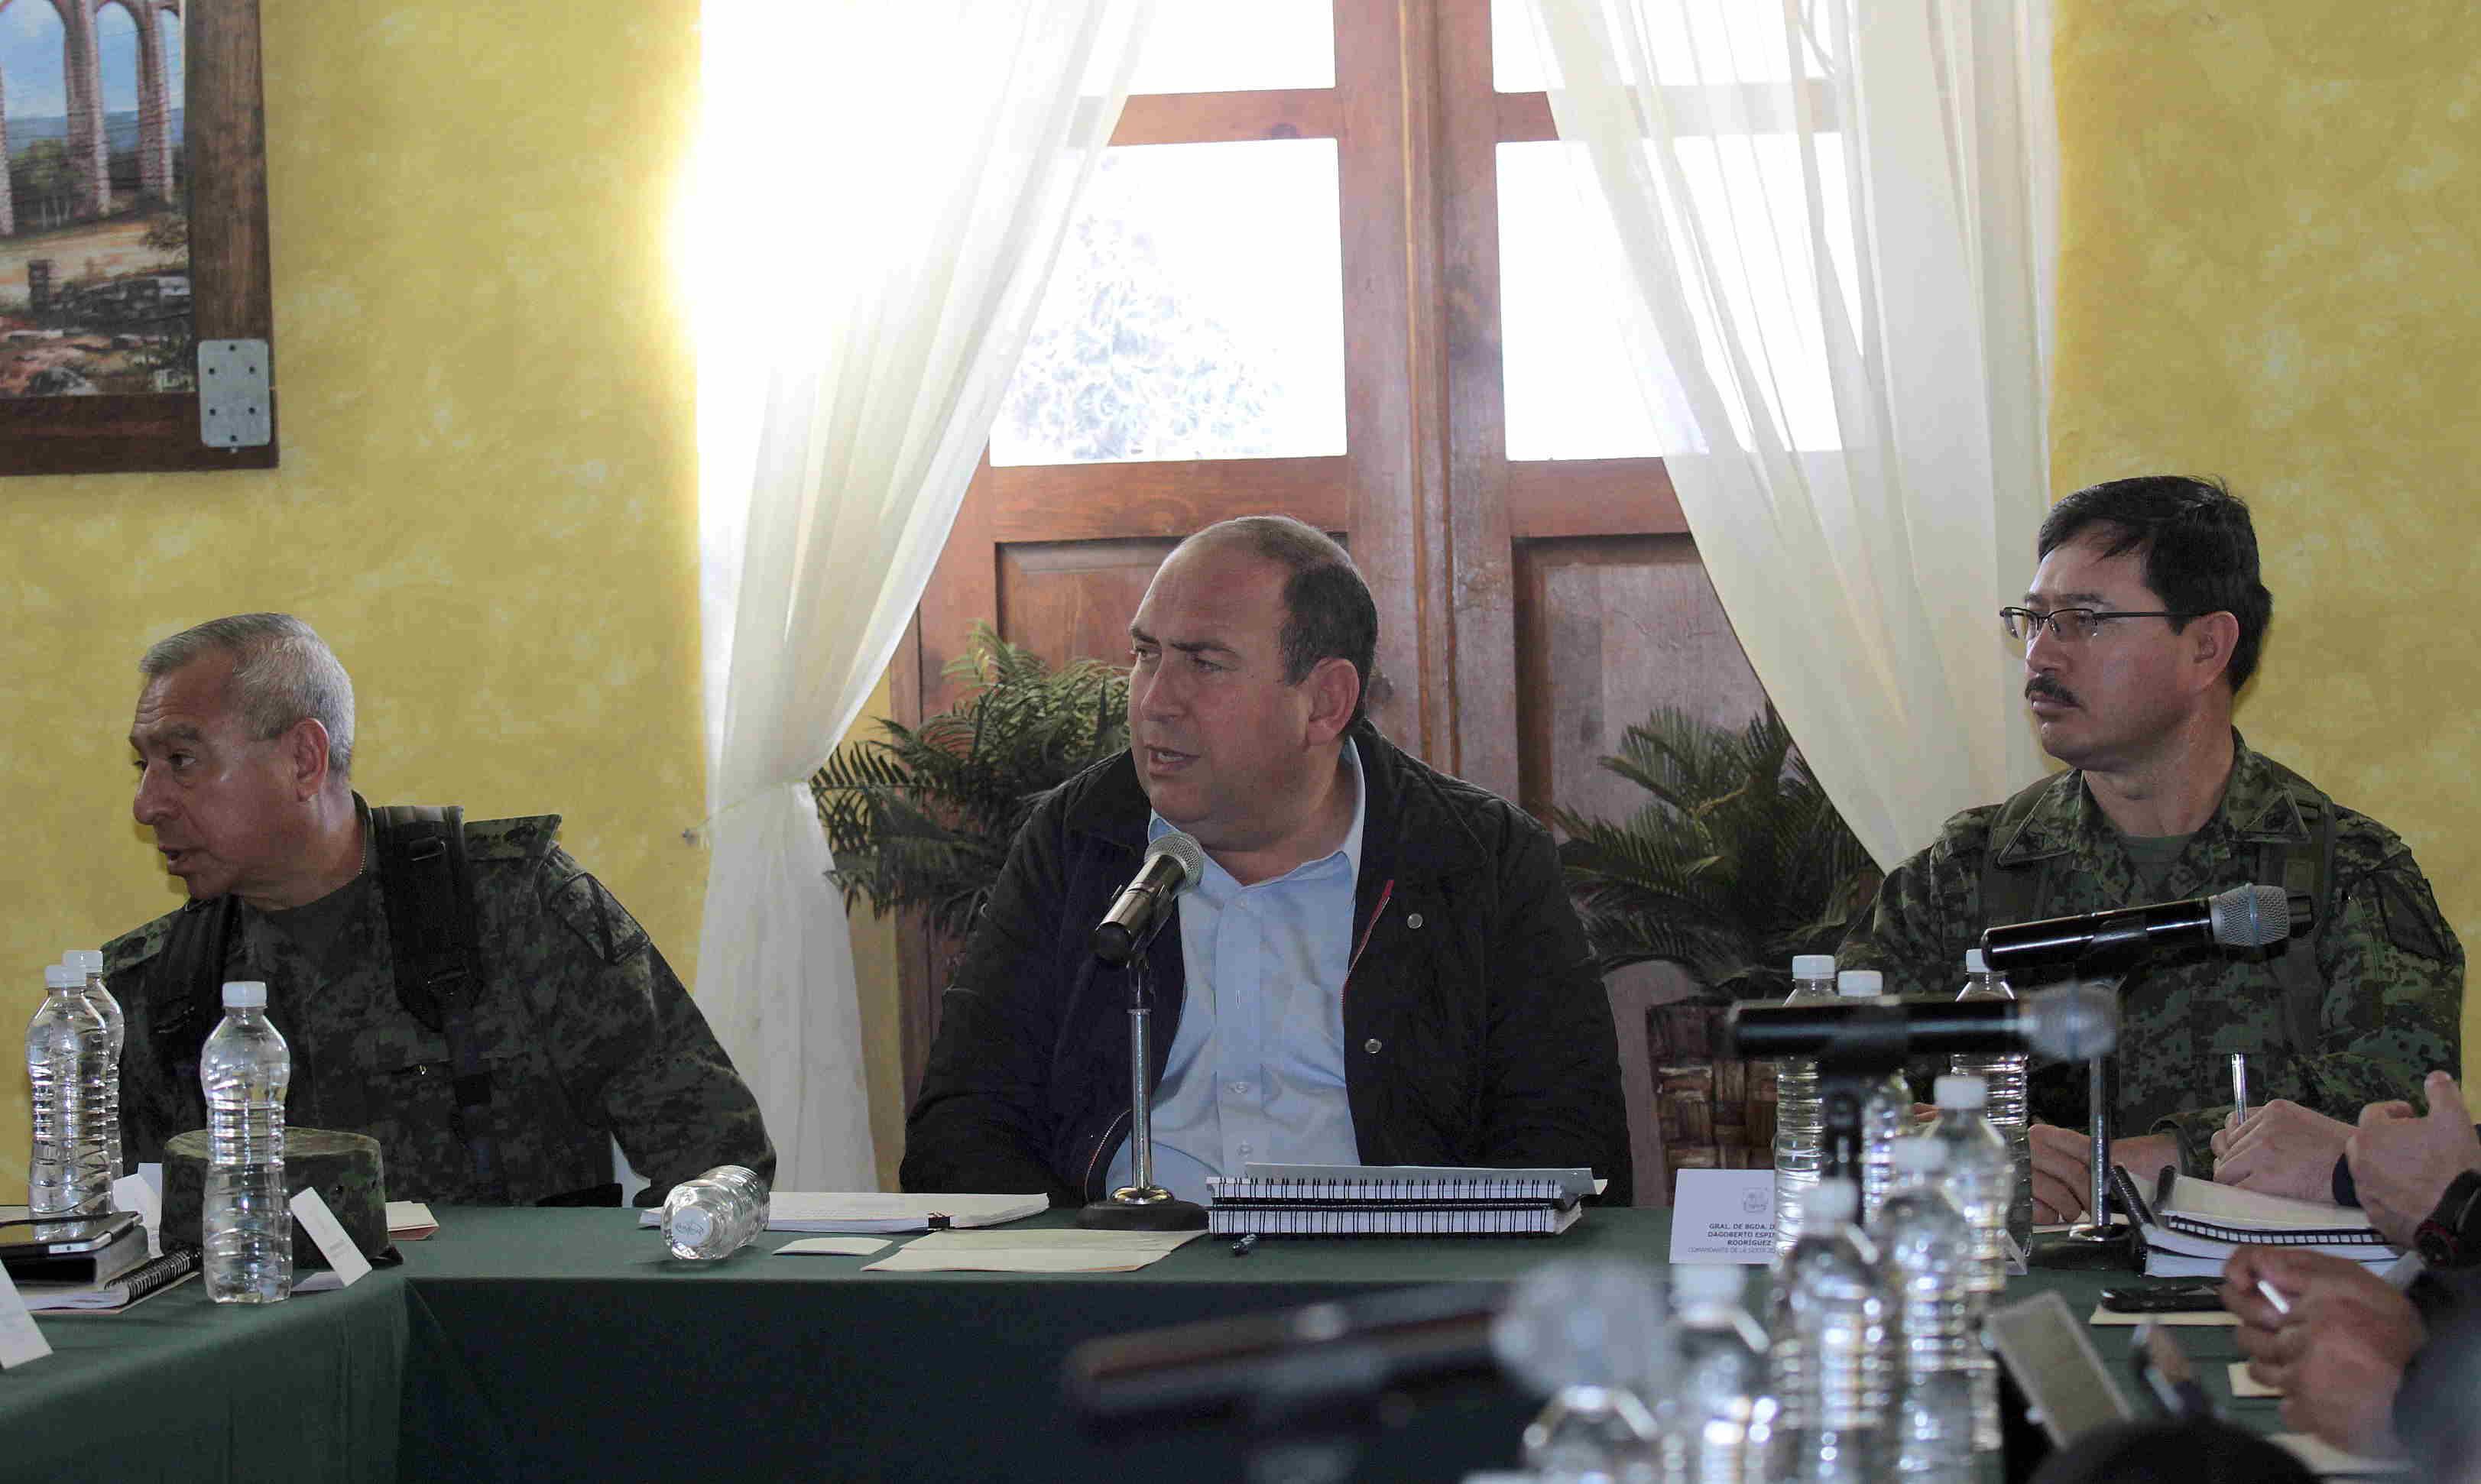 Encabeza RMV reunión del grupo de coordinación operativa, en San Pedro